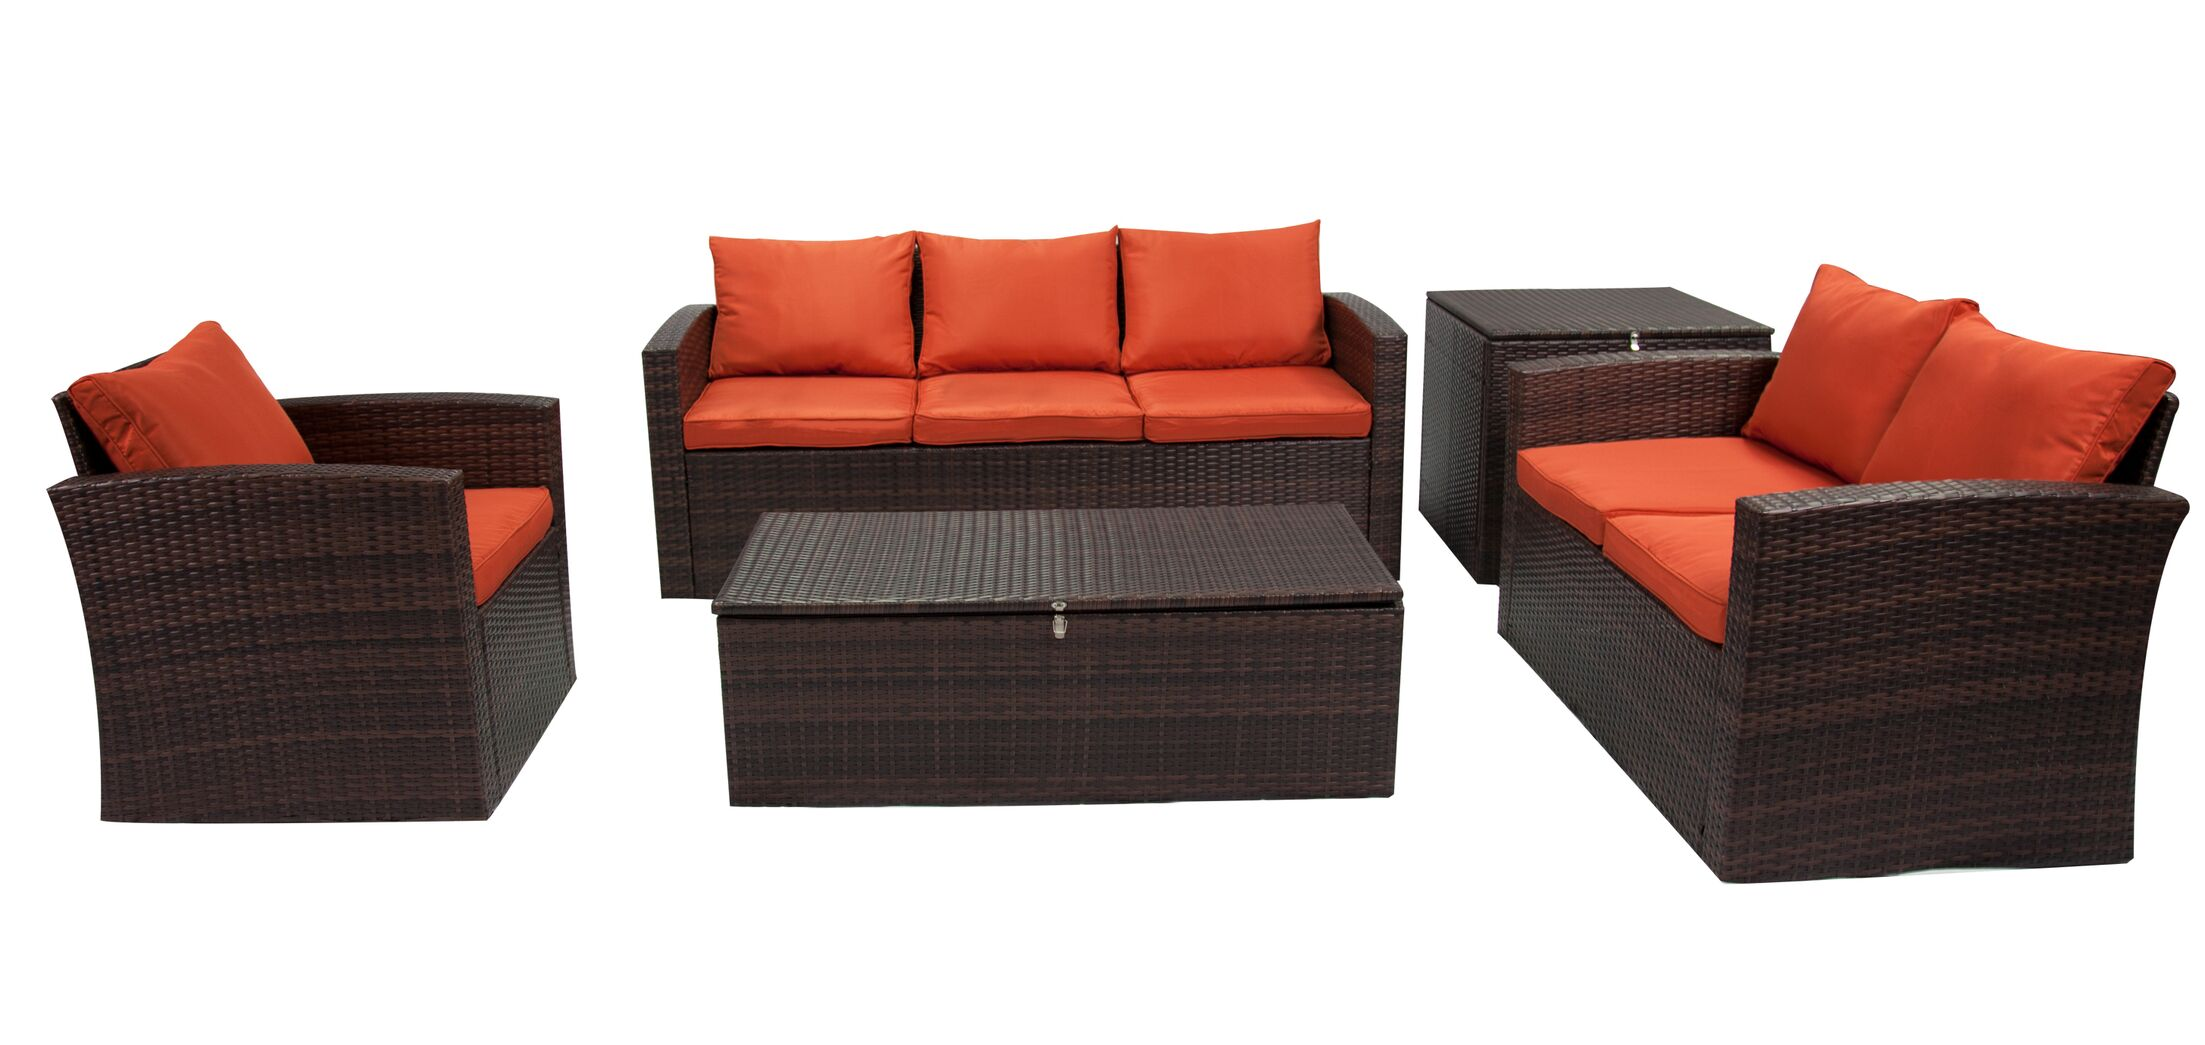 Marisa 5 Piece Rattan Sofa Seating Group Frame Finish: Brown, Fabric: Orange